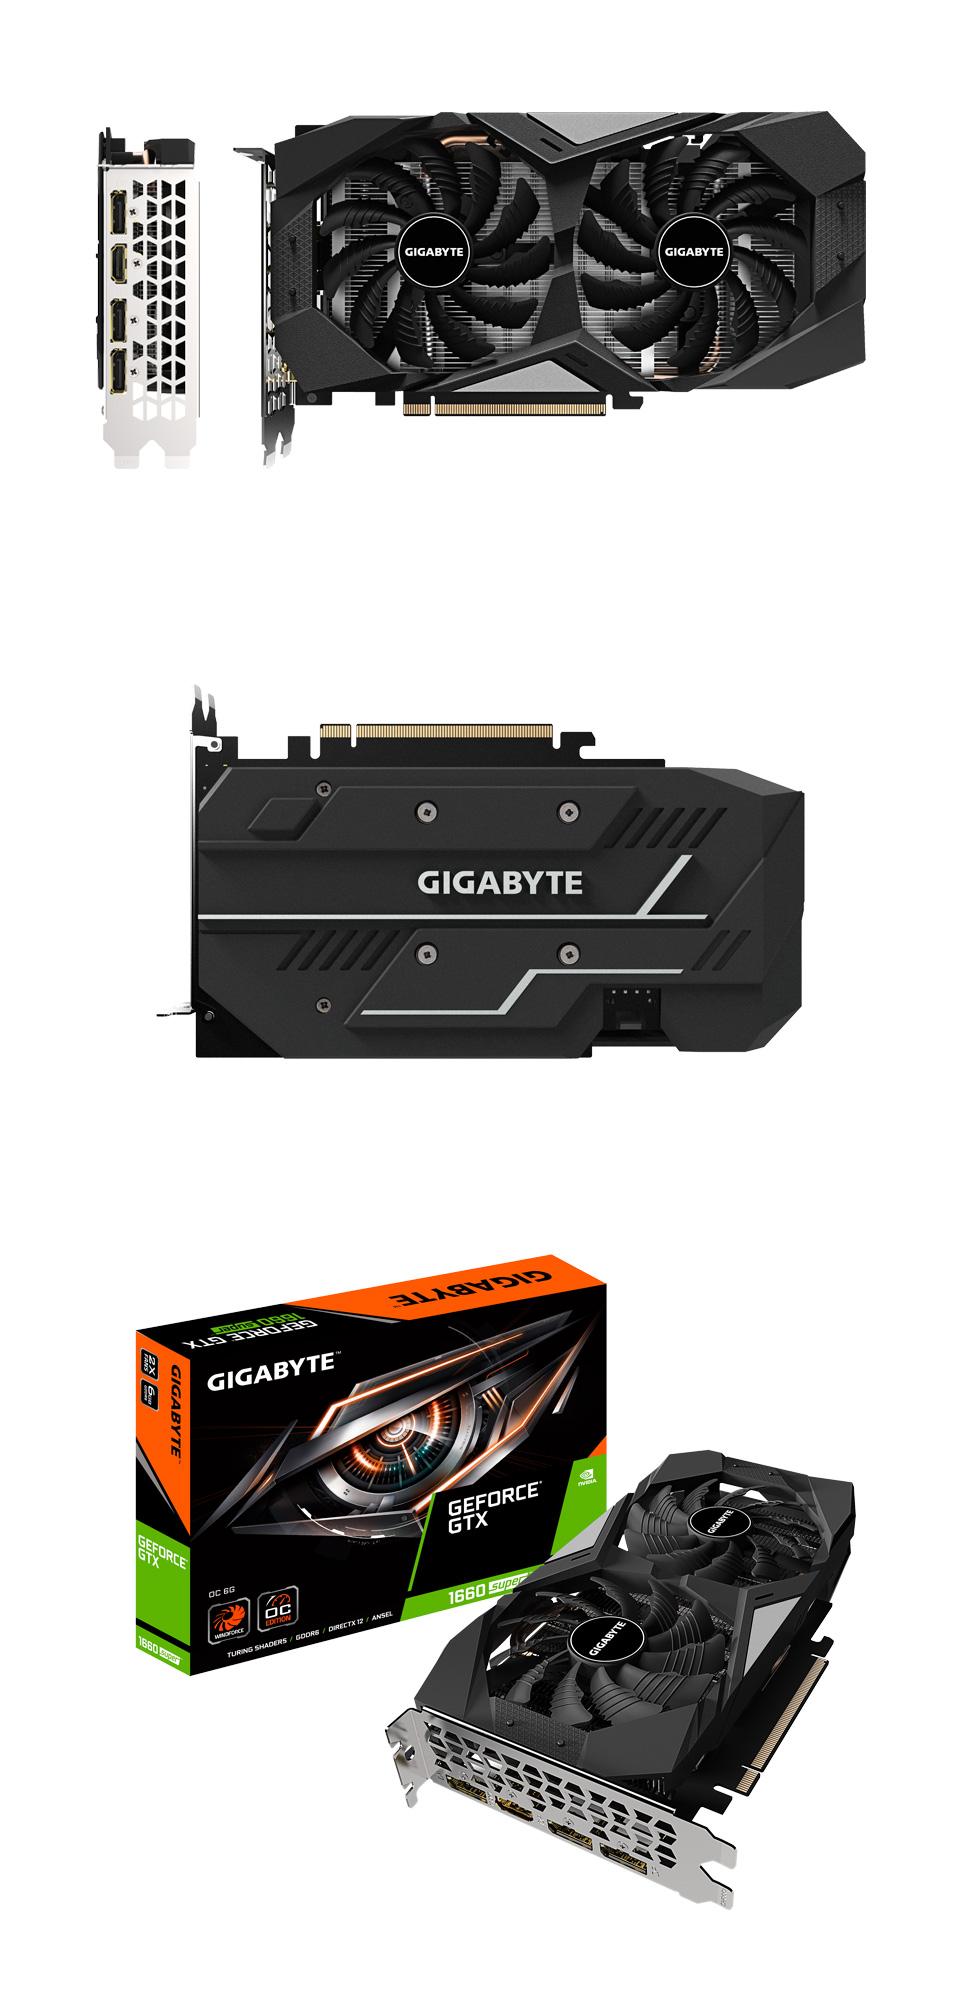 Gigabyte GeForce GTX 1660 Super OC 6GB product